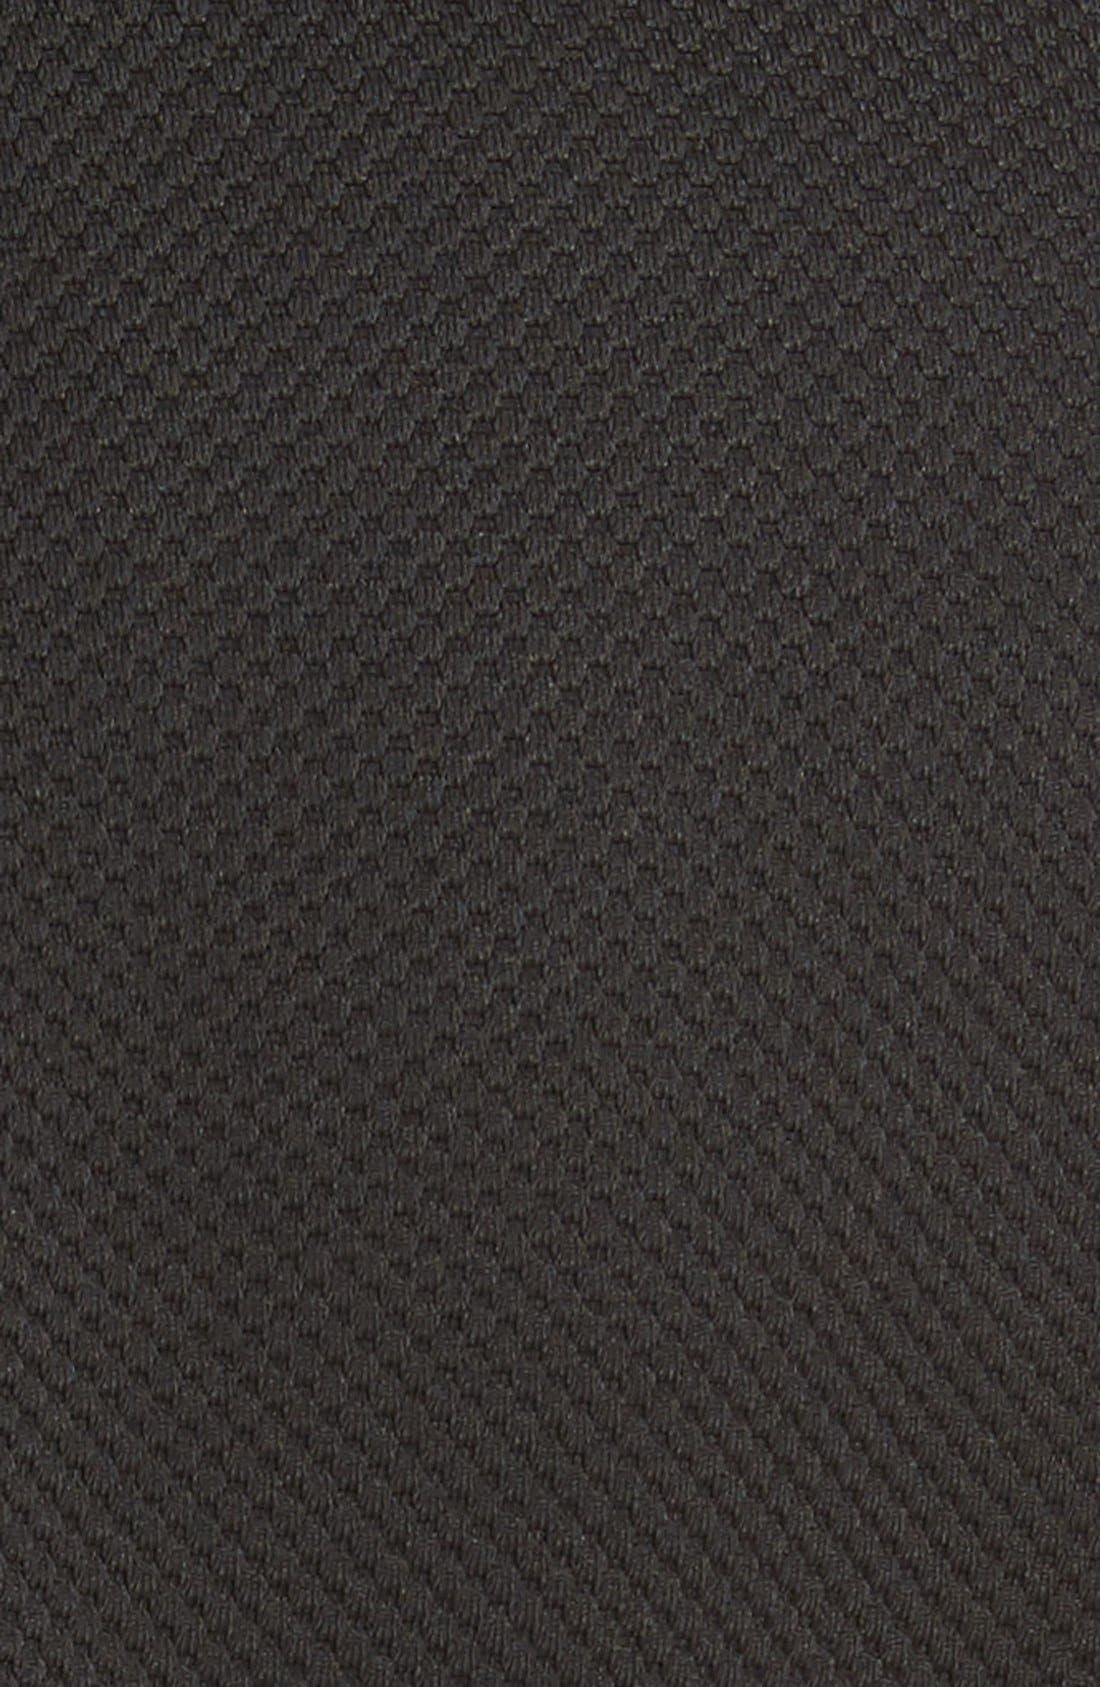 REBECCA TAYLOR, Stacy Drop Waist Dress, Alternate thumbnail 2, color, BLACK